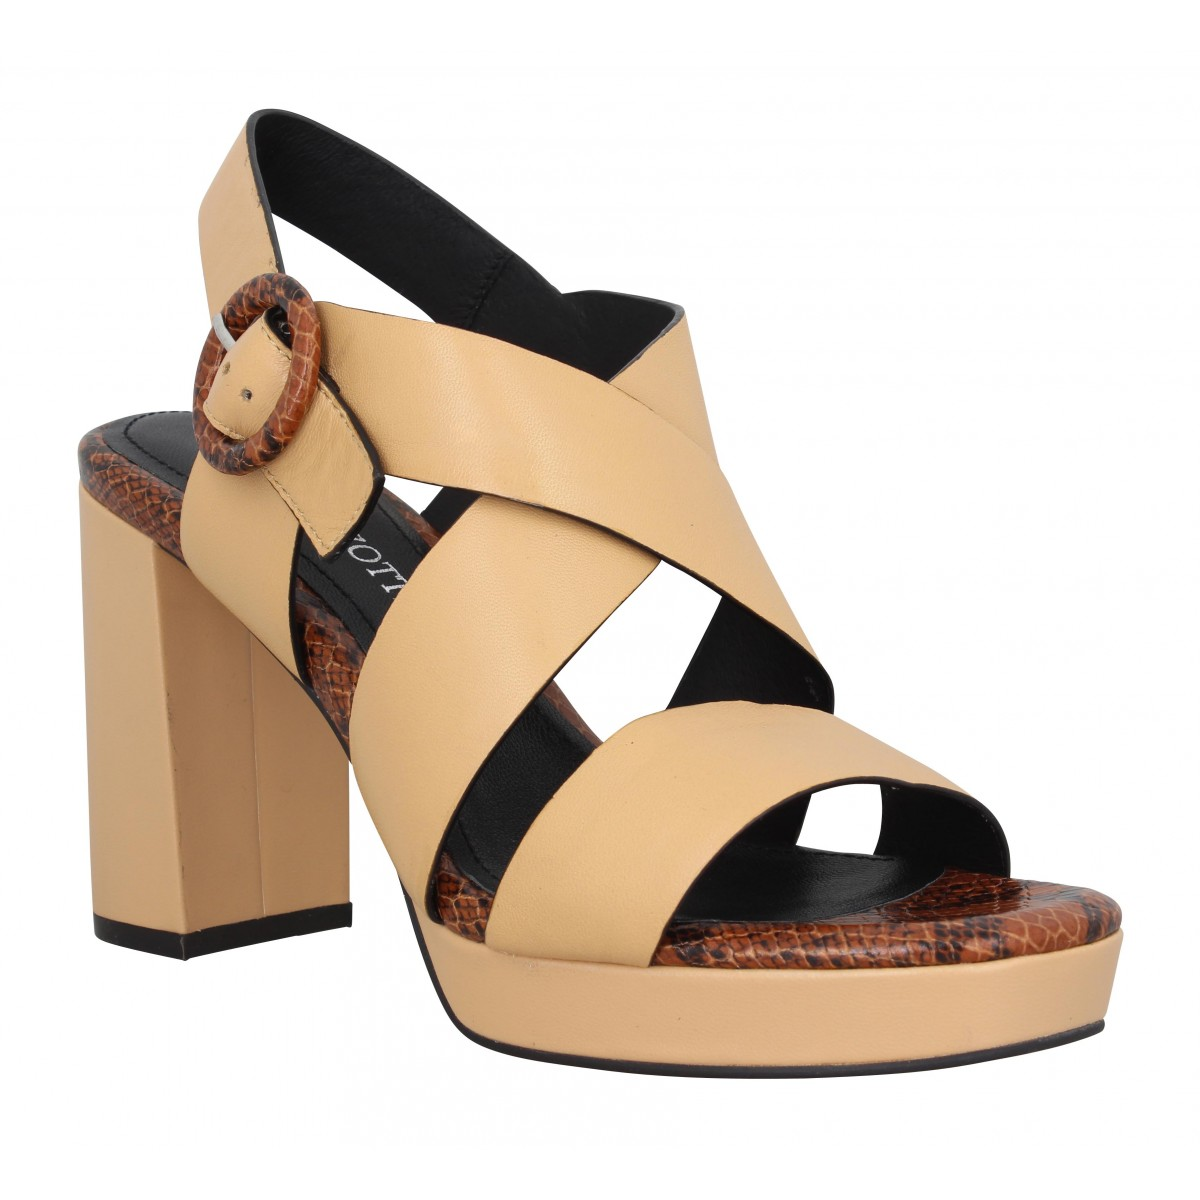 Sandales talons ADELE DEZOTTI 1708 cuir Femme Camel